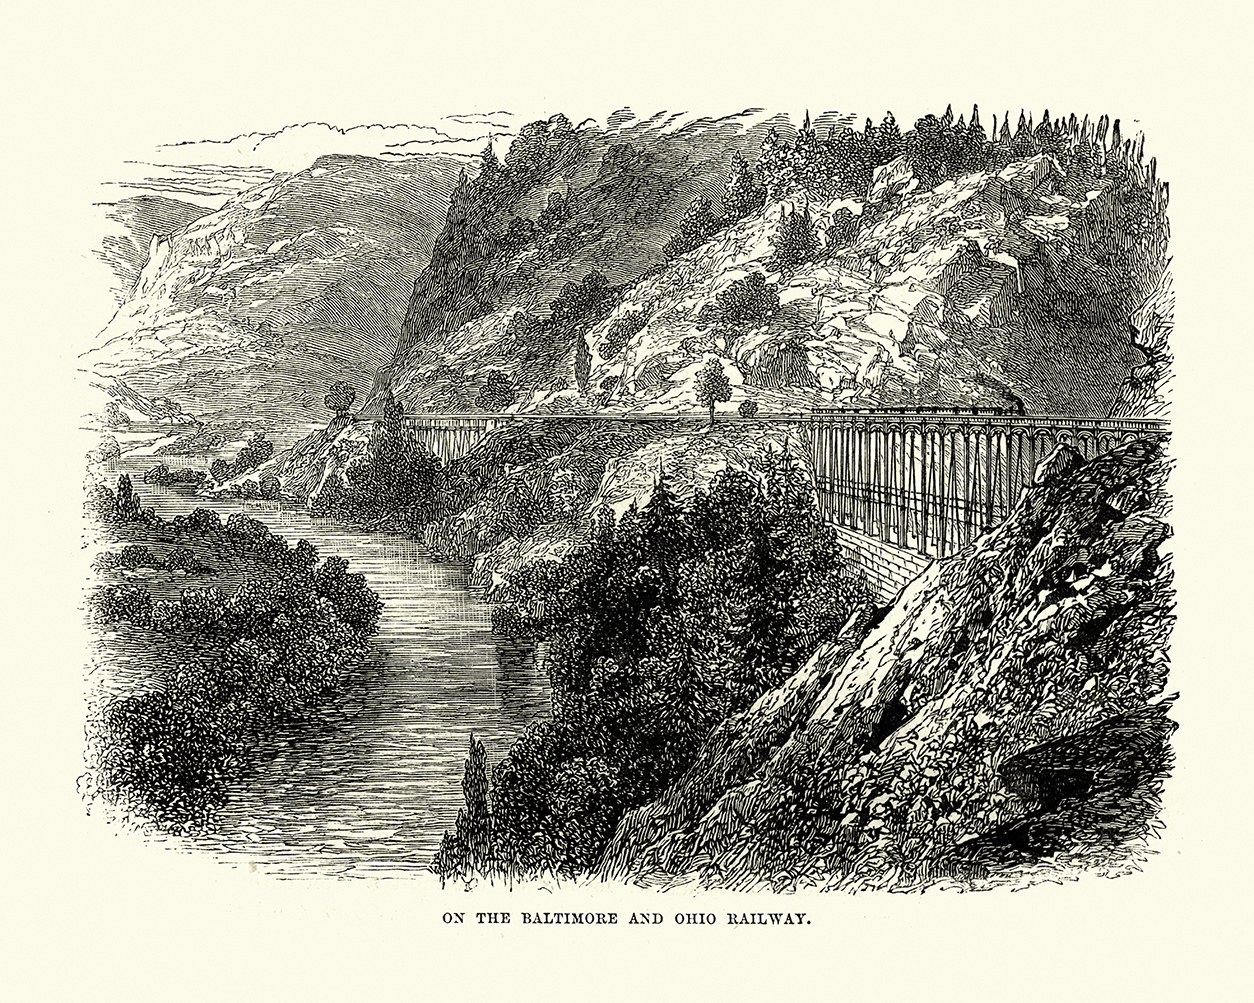 baltimore-and-ohio-railway-engraving